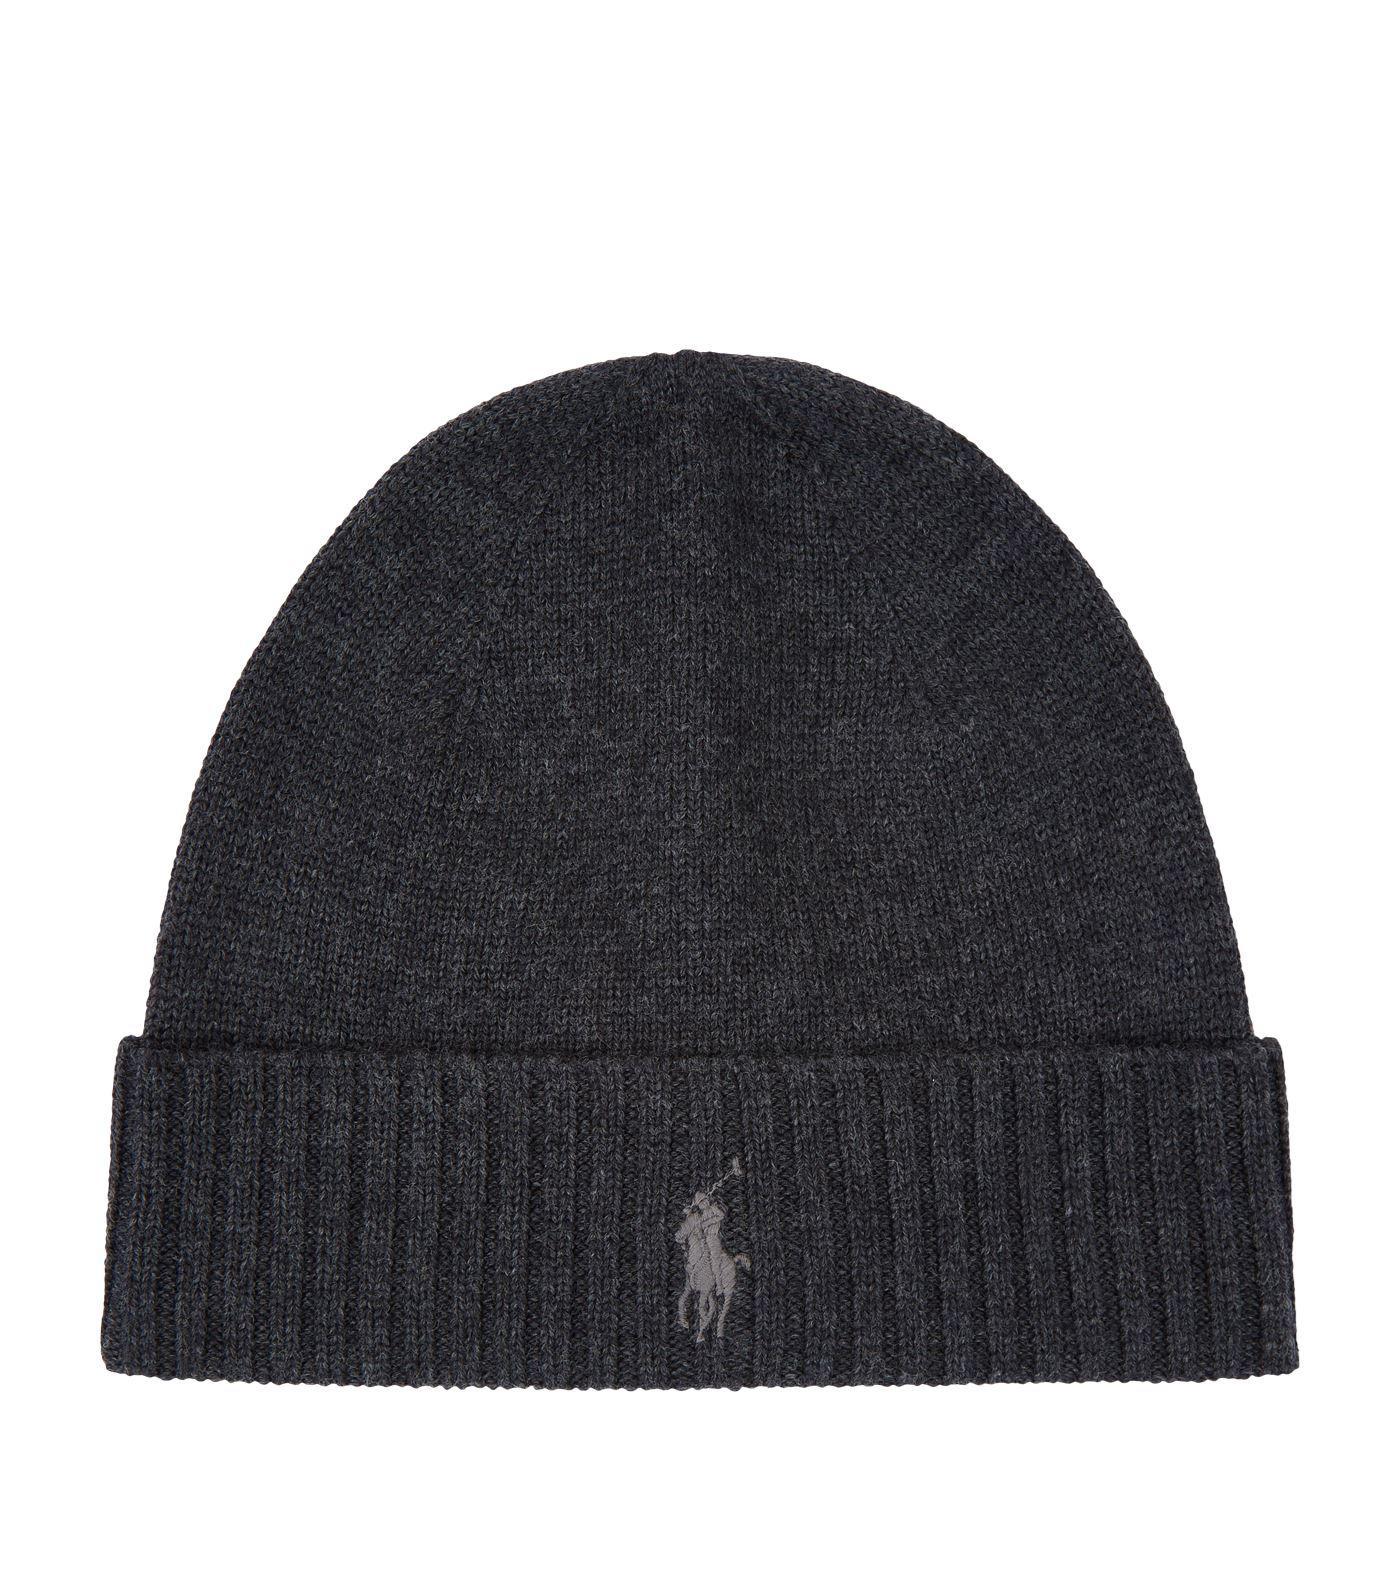 07f987eff3d Polo Ralph Lauren - Gray Merino Wool Ribbed Beanie Hat for Men - Lyst. View  fullscreen